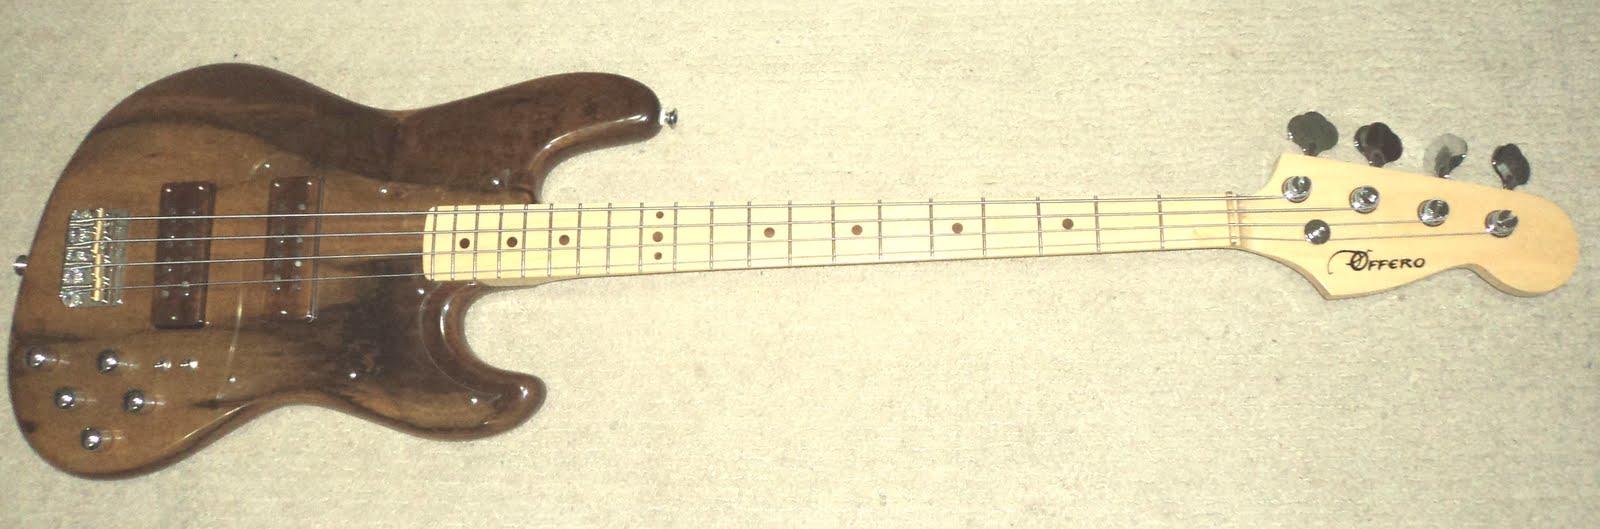 Circuito Jazz Bass Pasivo : Offero guitars jazz bass cordas circuito e captação jb